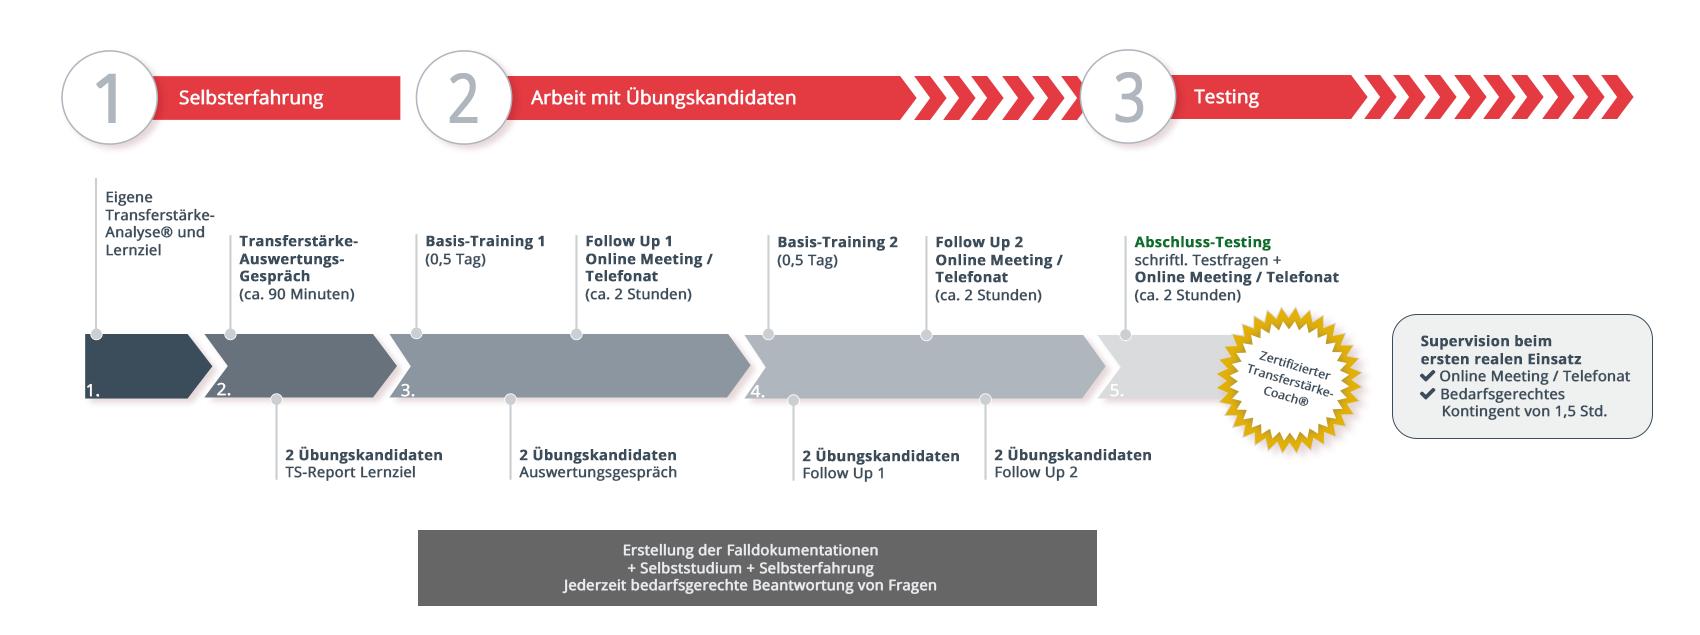 Schaubild_Zertifizierung_Transferstaerke-Coach